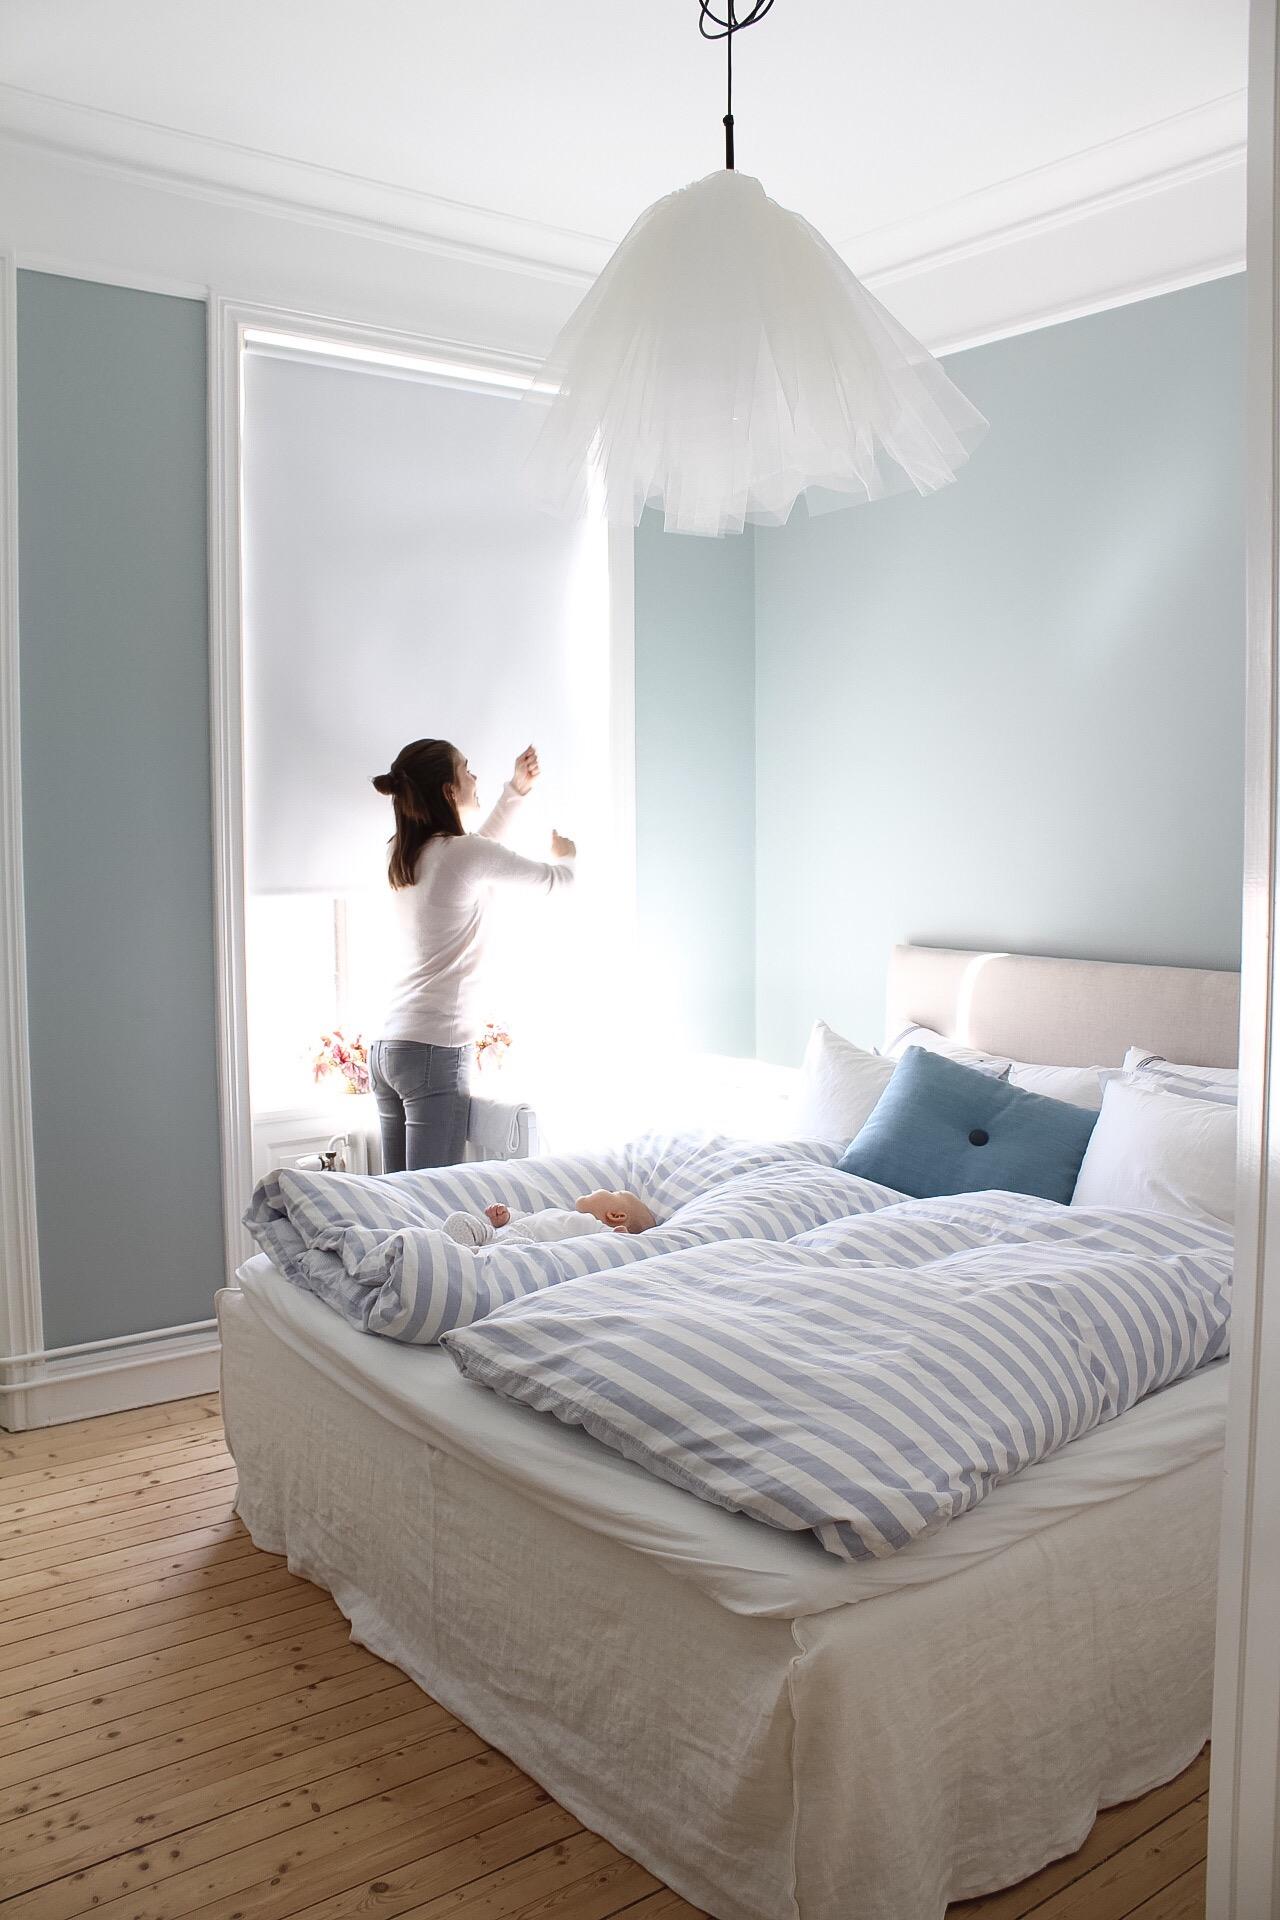 Kristins drömmiga lägenhet